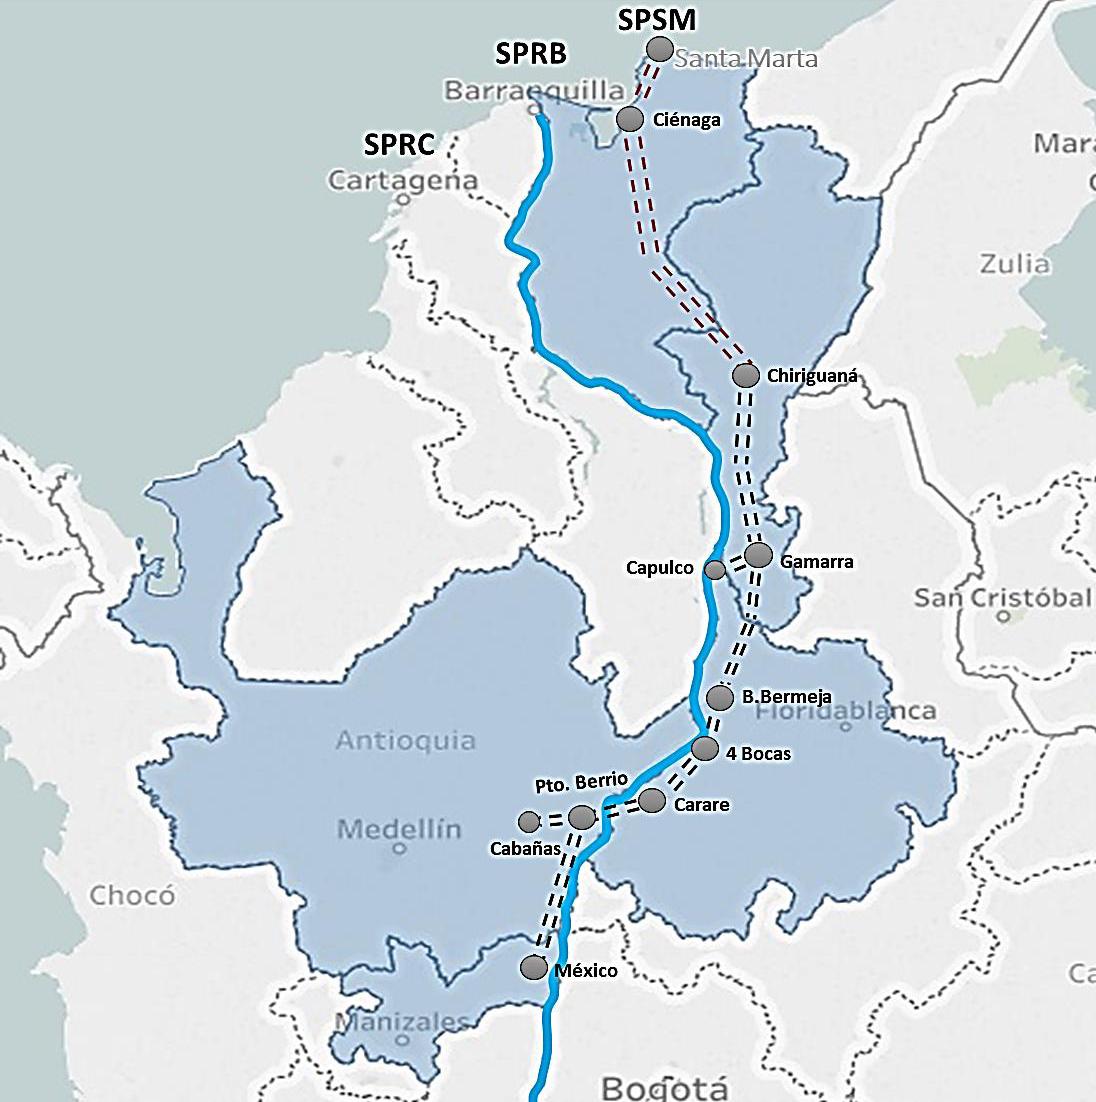 RUBAU - APP CORREDOR CENTRAL